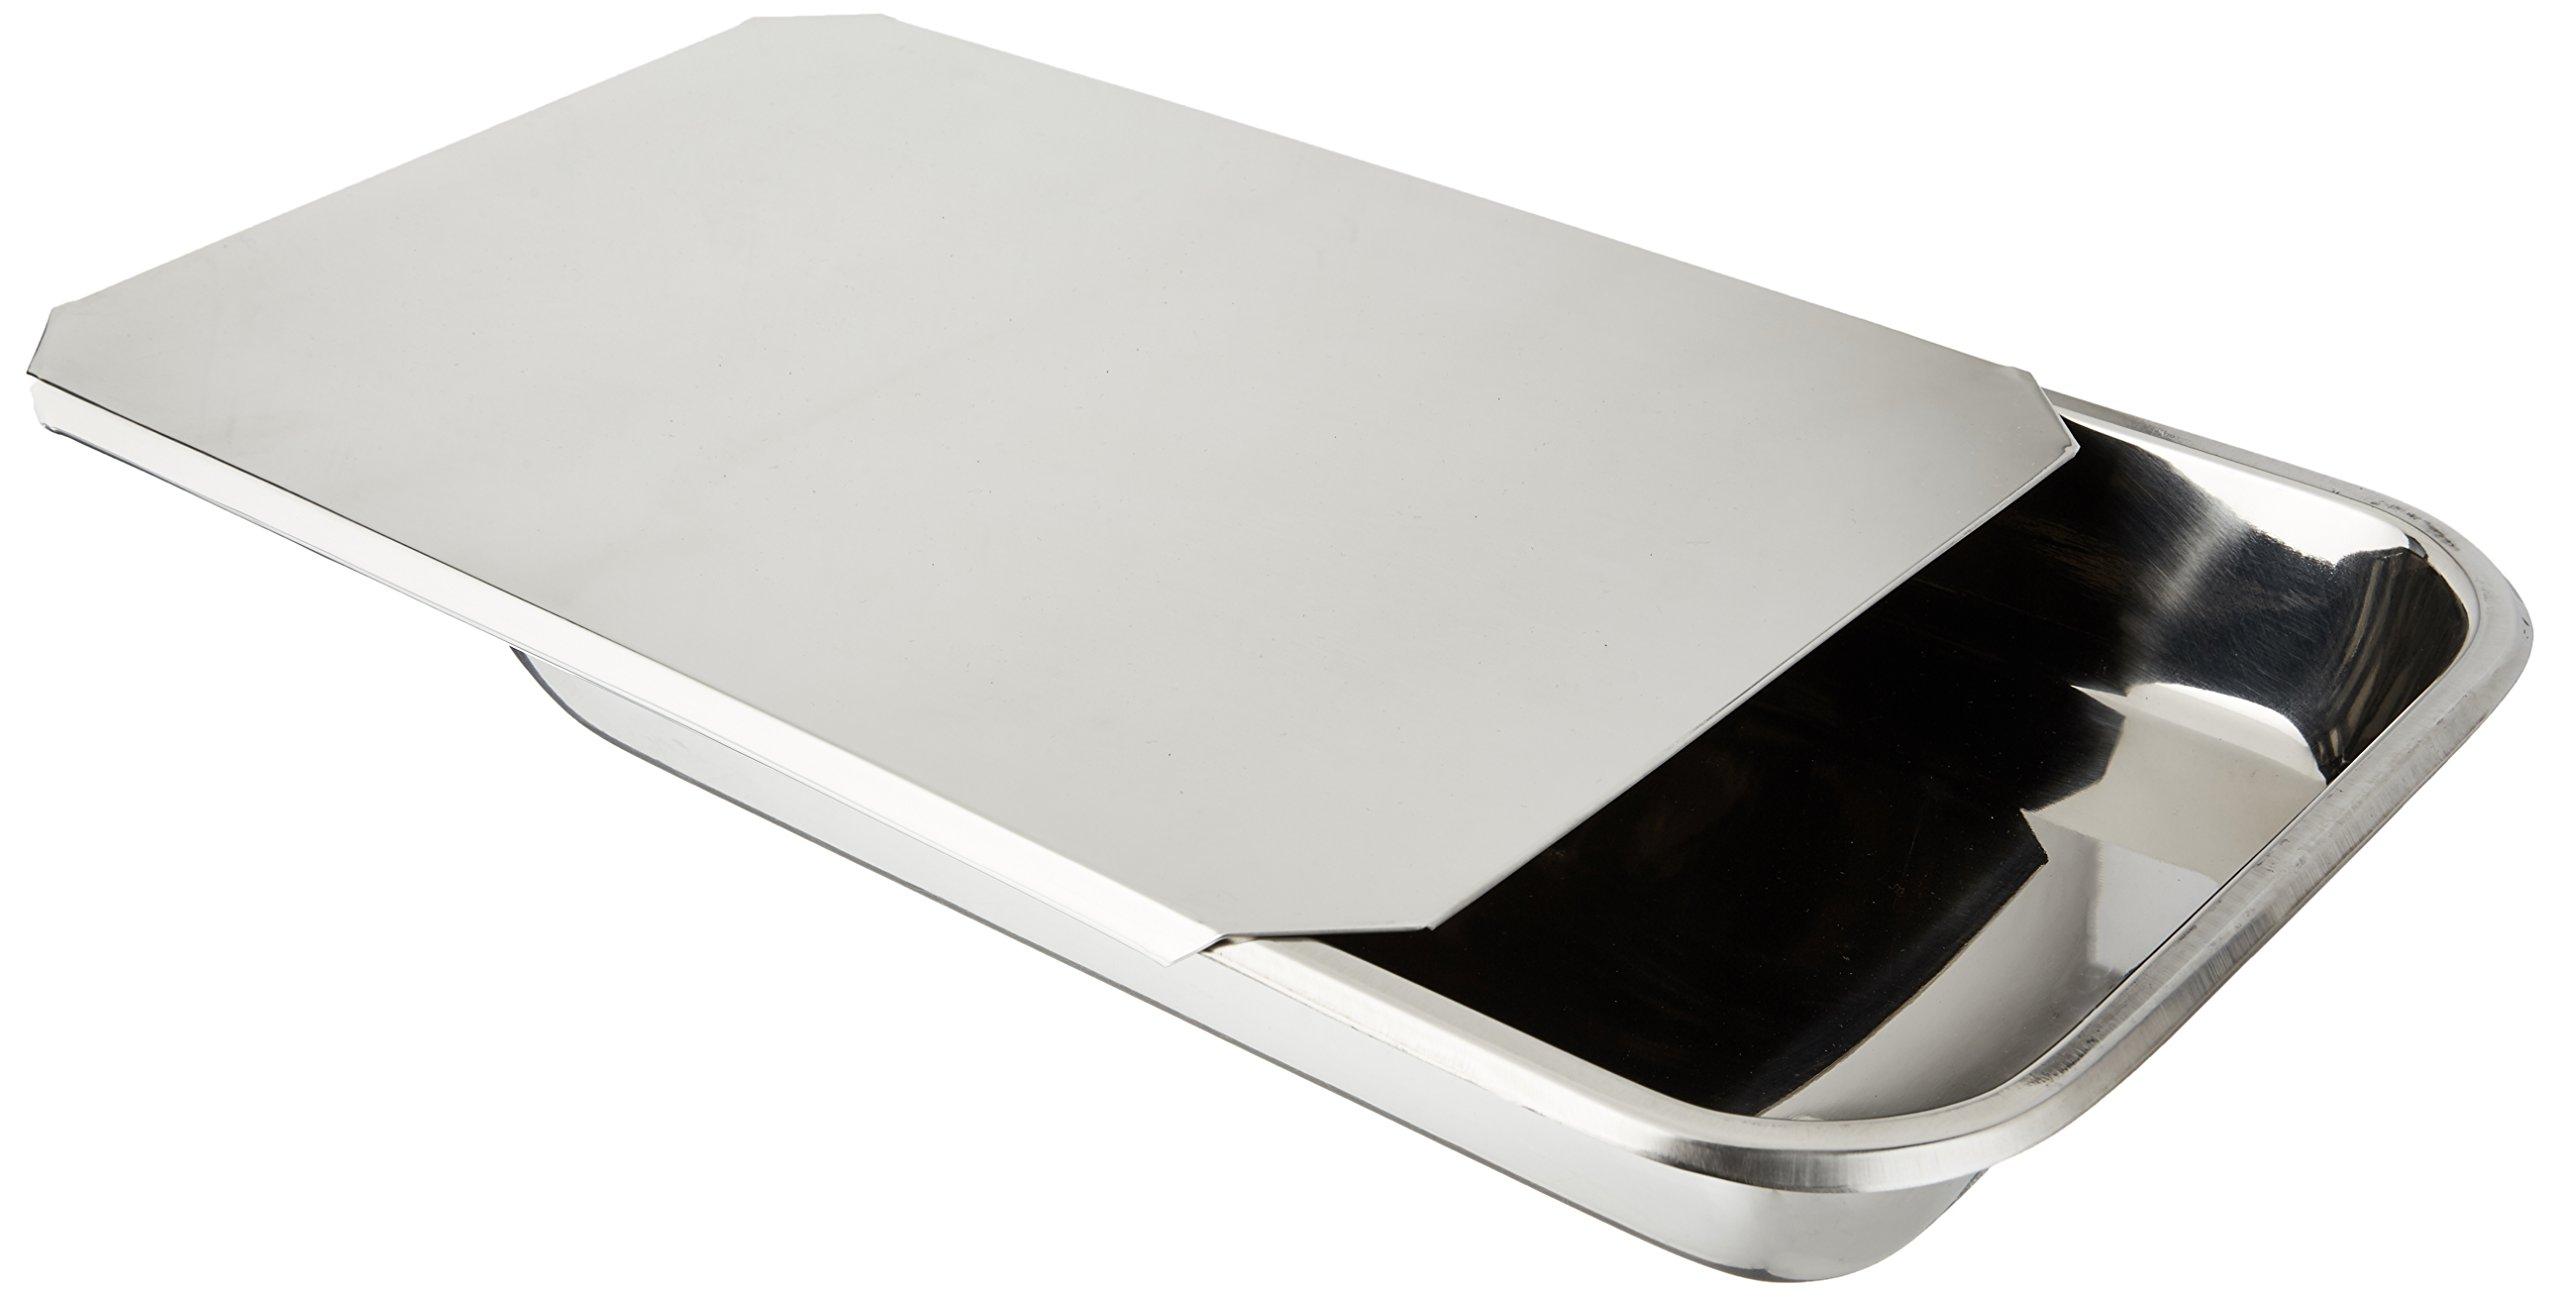 Hammer Stahl 9'' x 13'' Covered Bake Pan, Stainless Steel